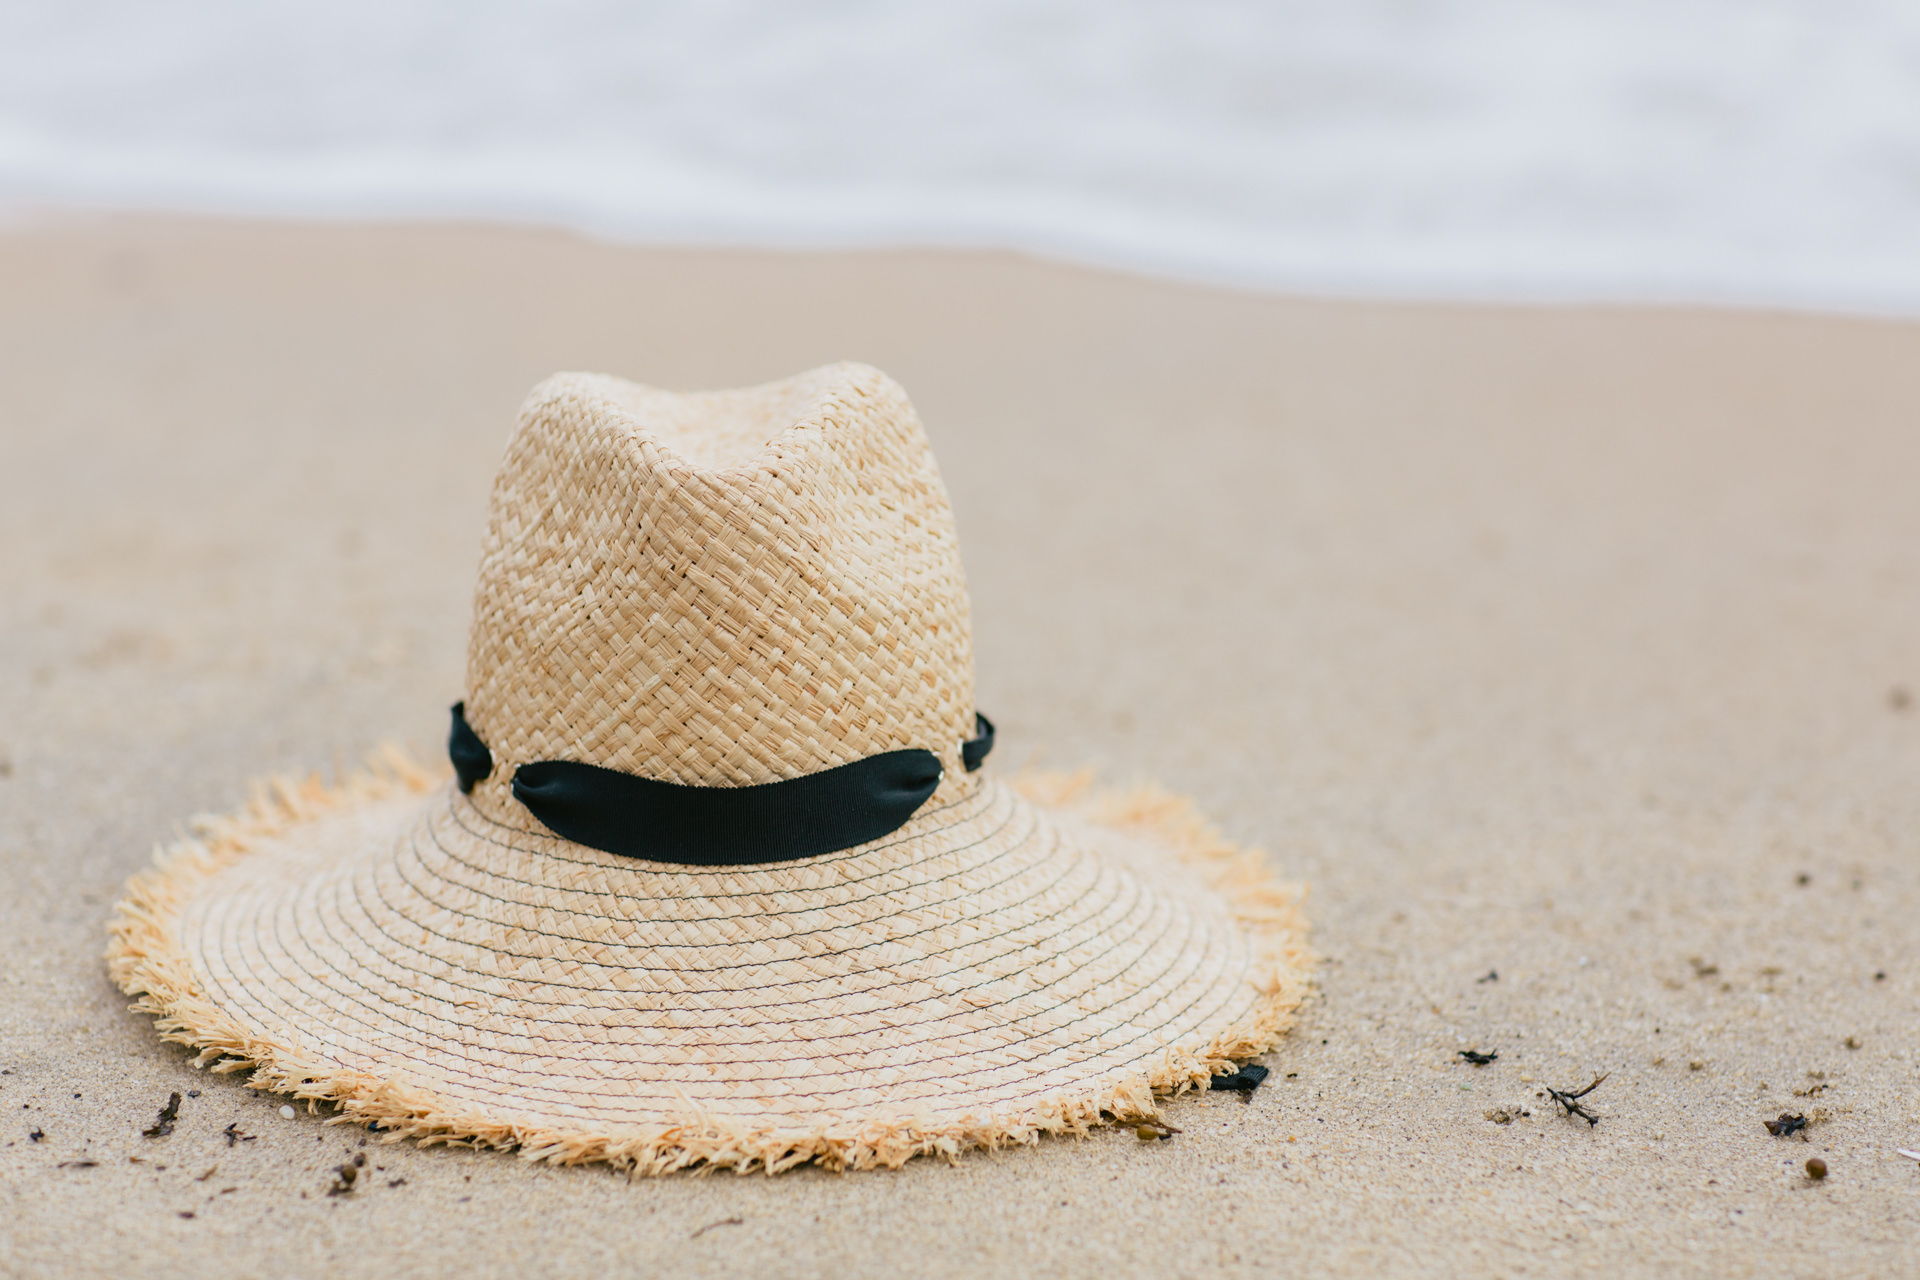 beach hat on sand